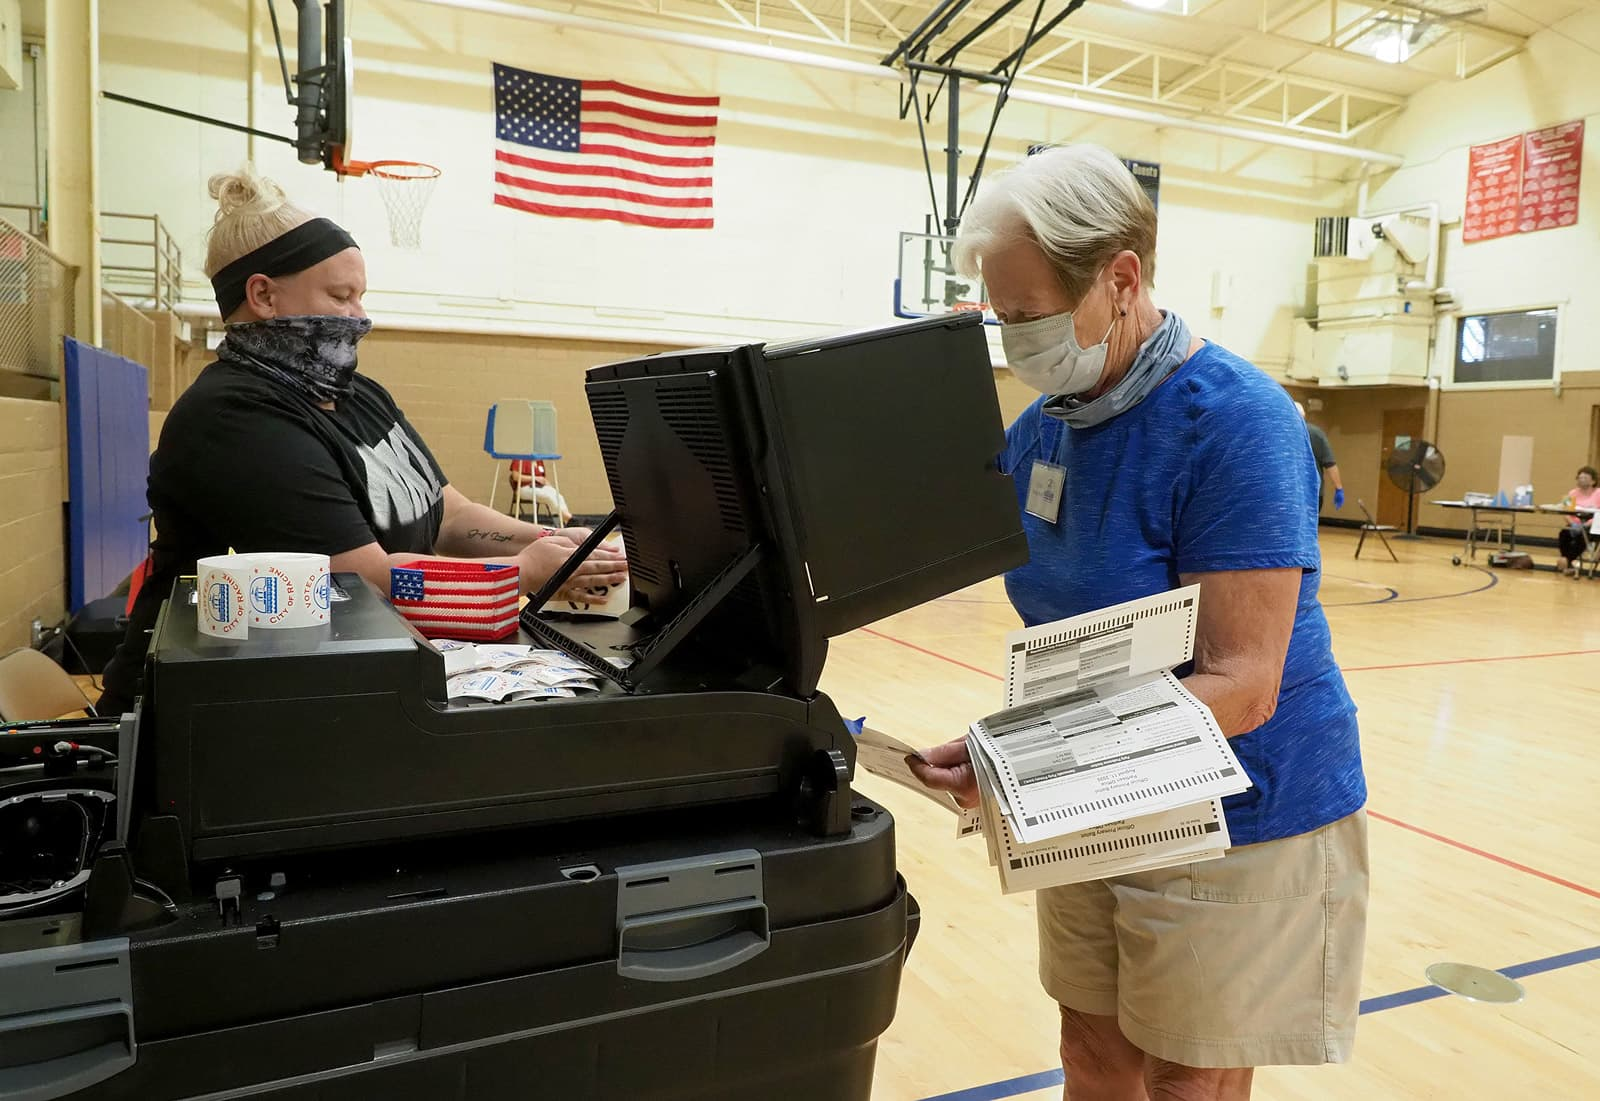 Centre de recompte i escaneig de paperetes de vot per correu a Milwaukee el passat 11 d'agost. Fotografia de Sue Dorfman. ZUMA Wire.